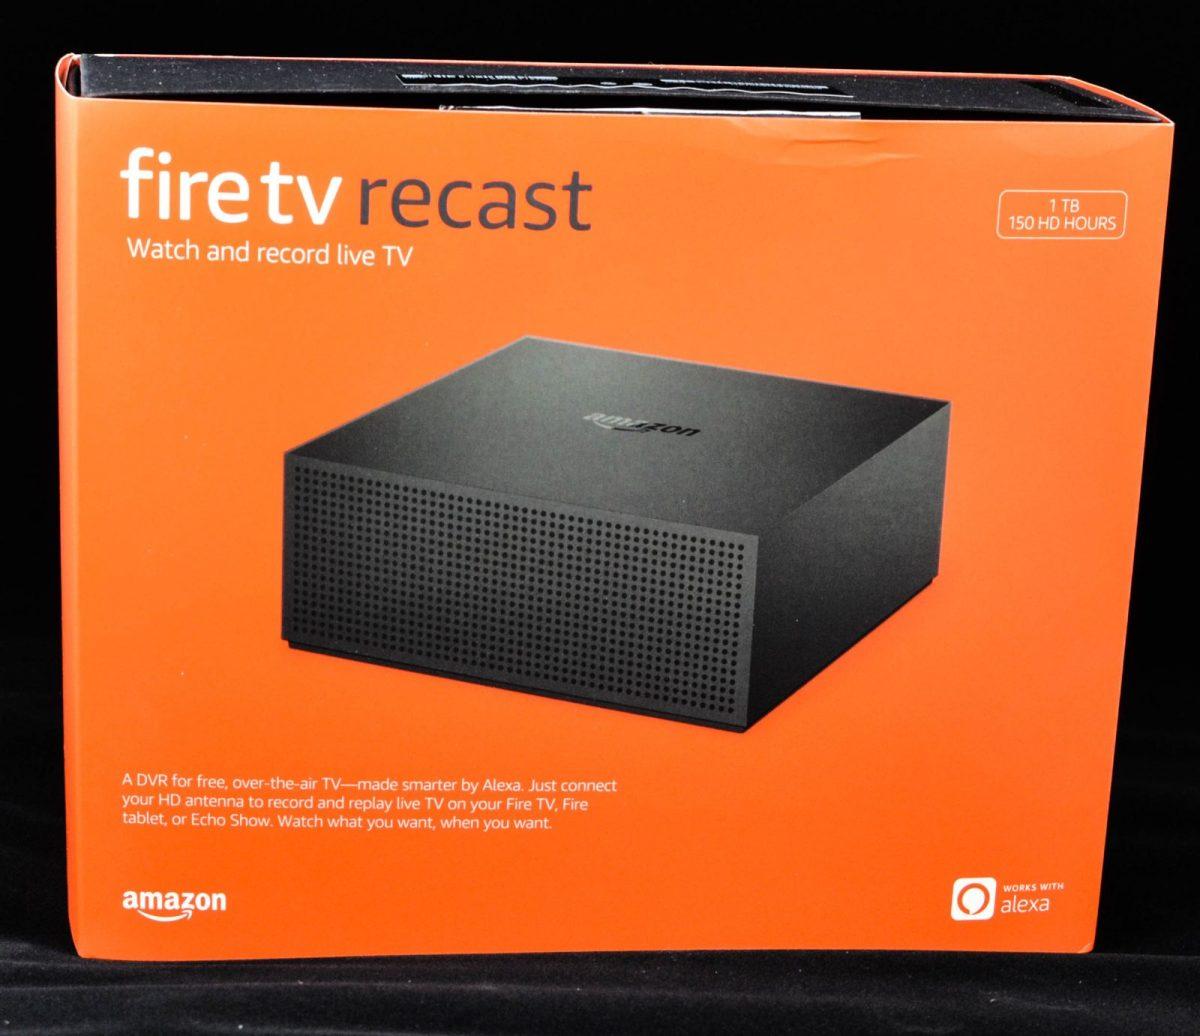 Amazon's Fire TV Recast DVR set-top box.